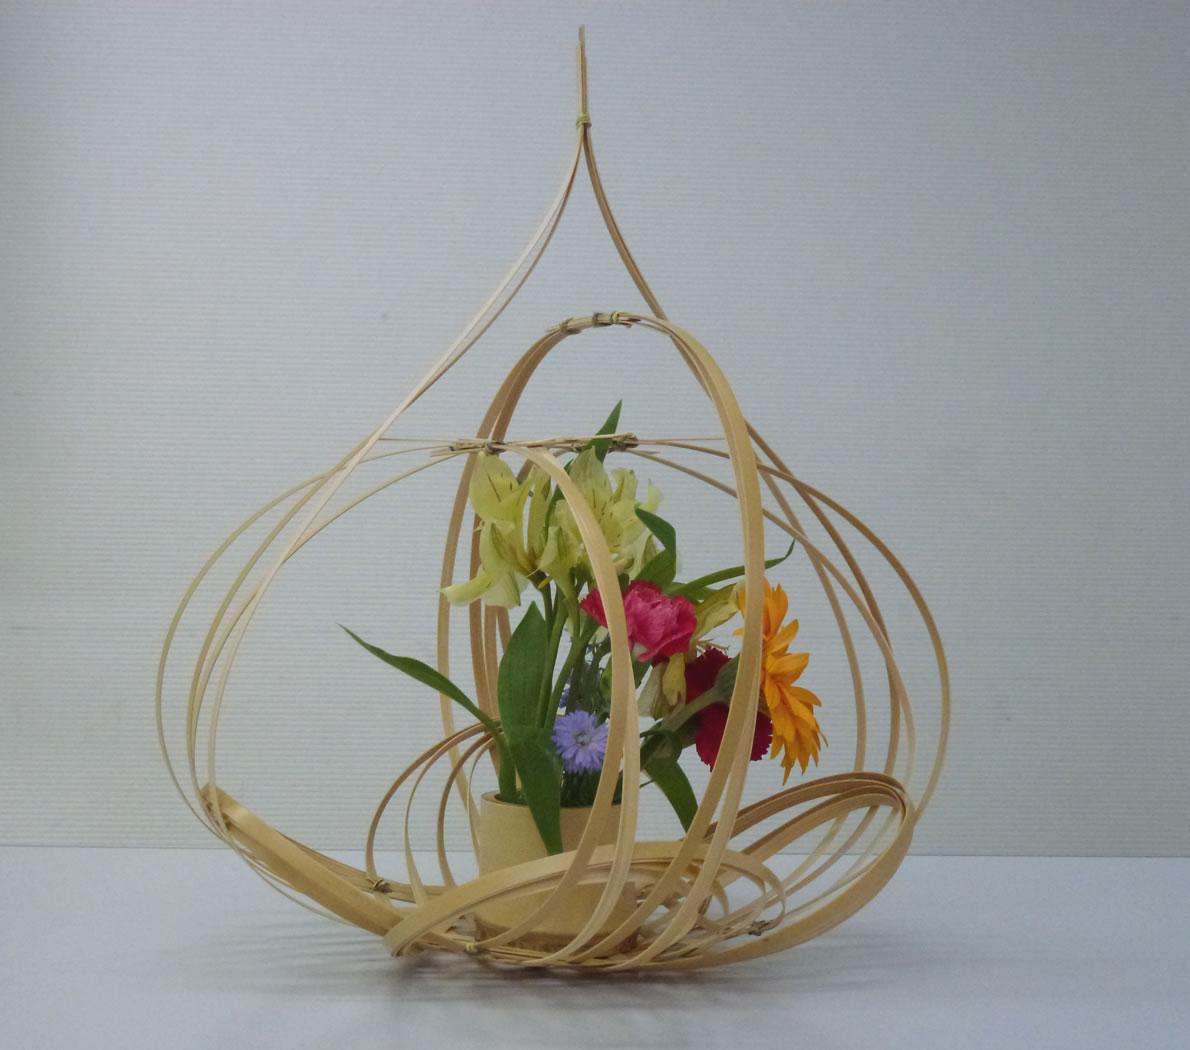 Art Of Basket Making : The art of bamboo basket making with sh chiku tanabe